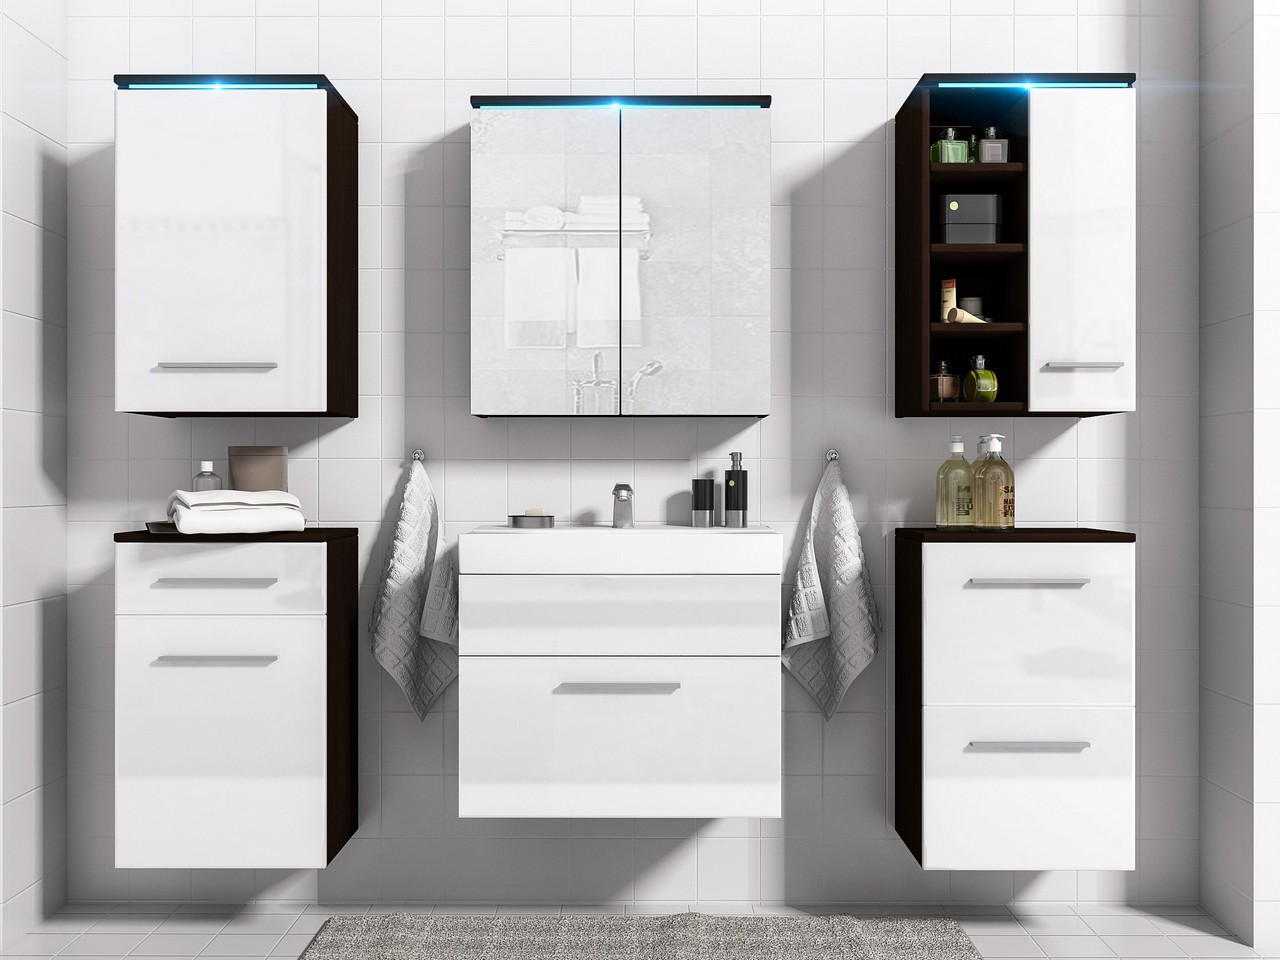 Kúpeľňa s LED osvetlením MEGI 10 Wenge / Biely lesk